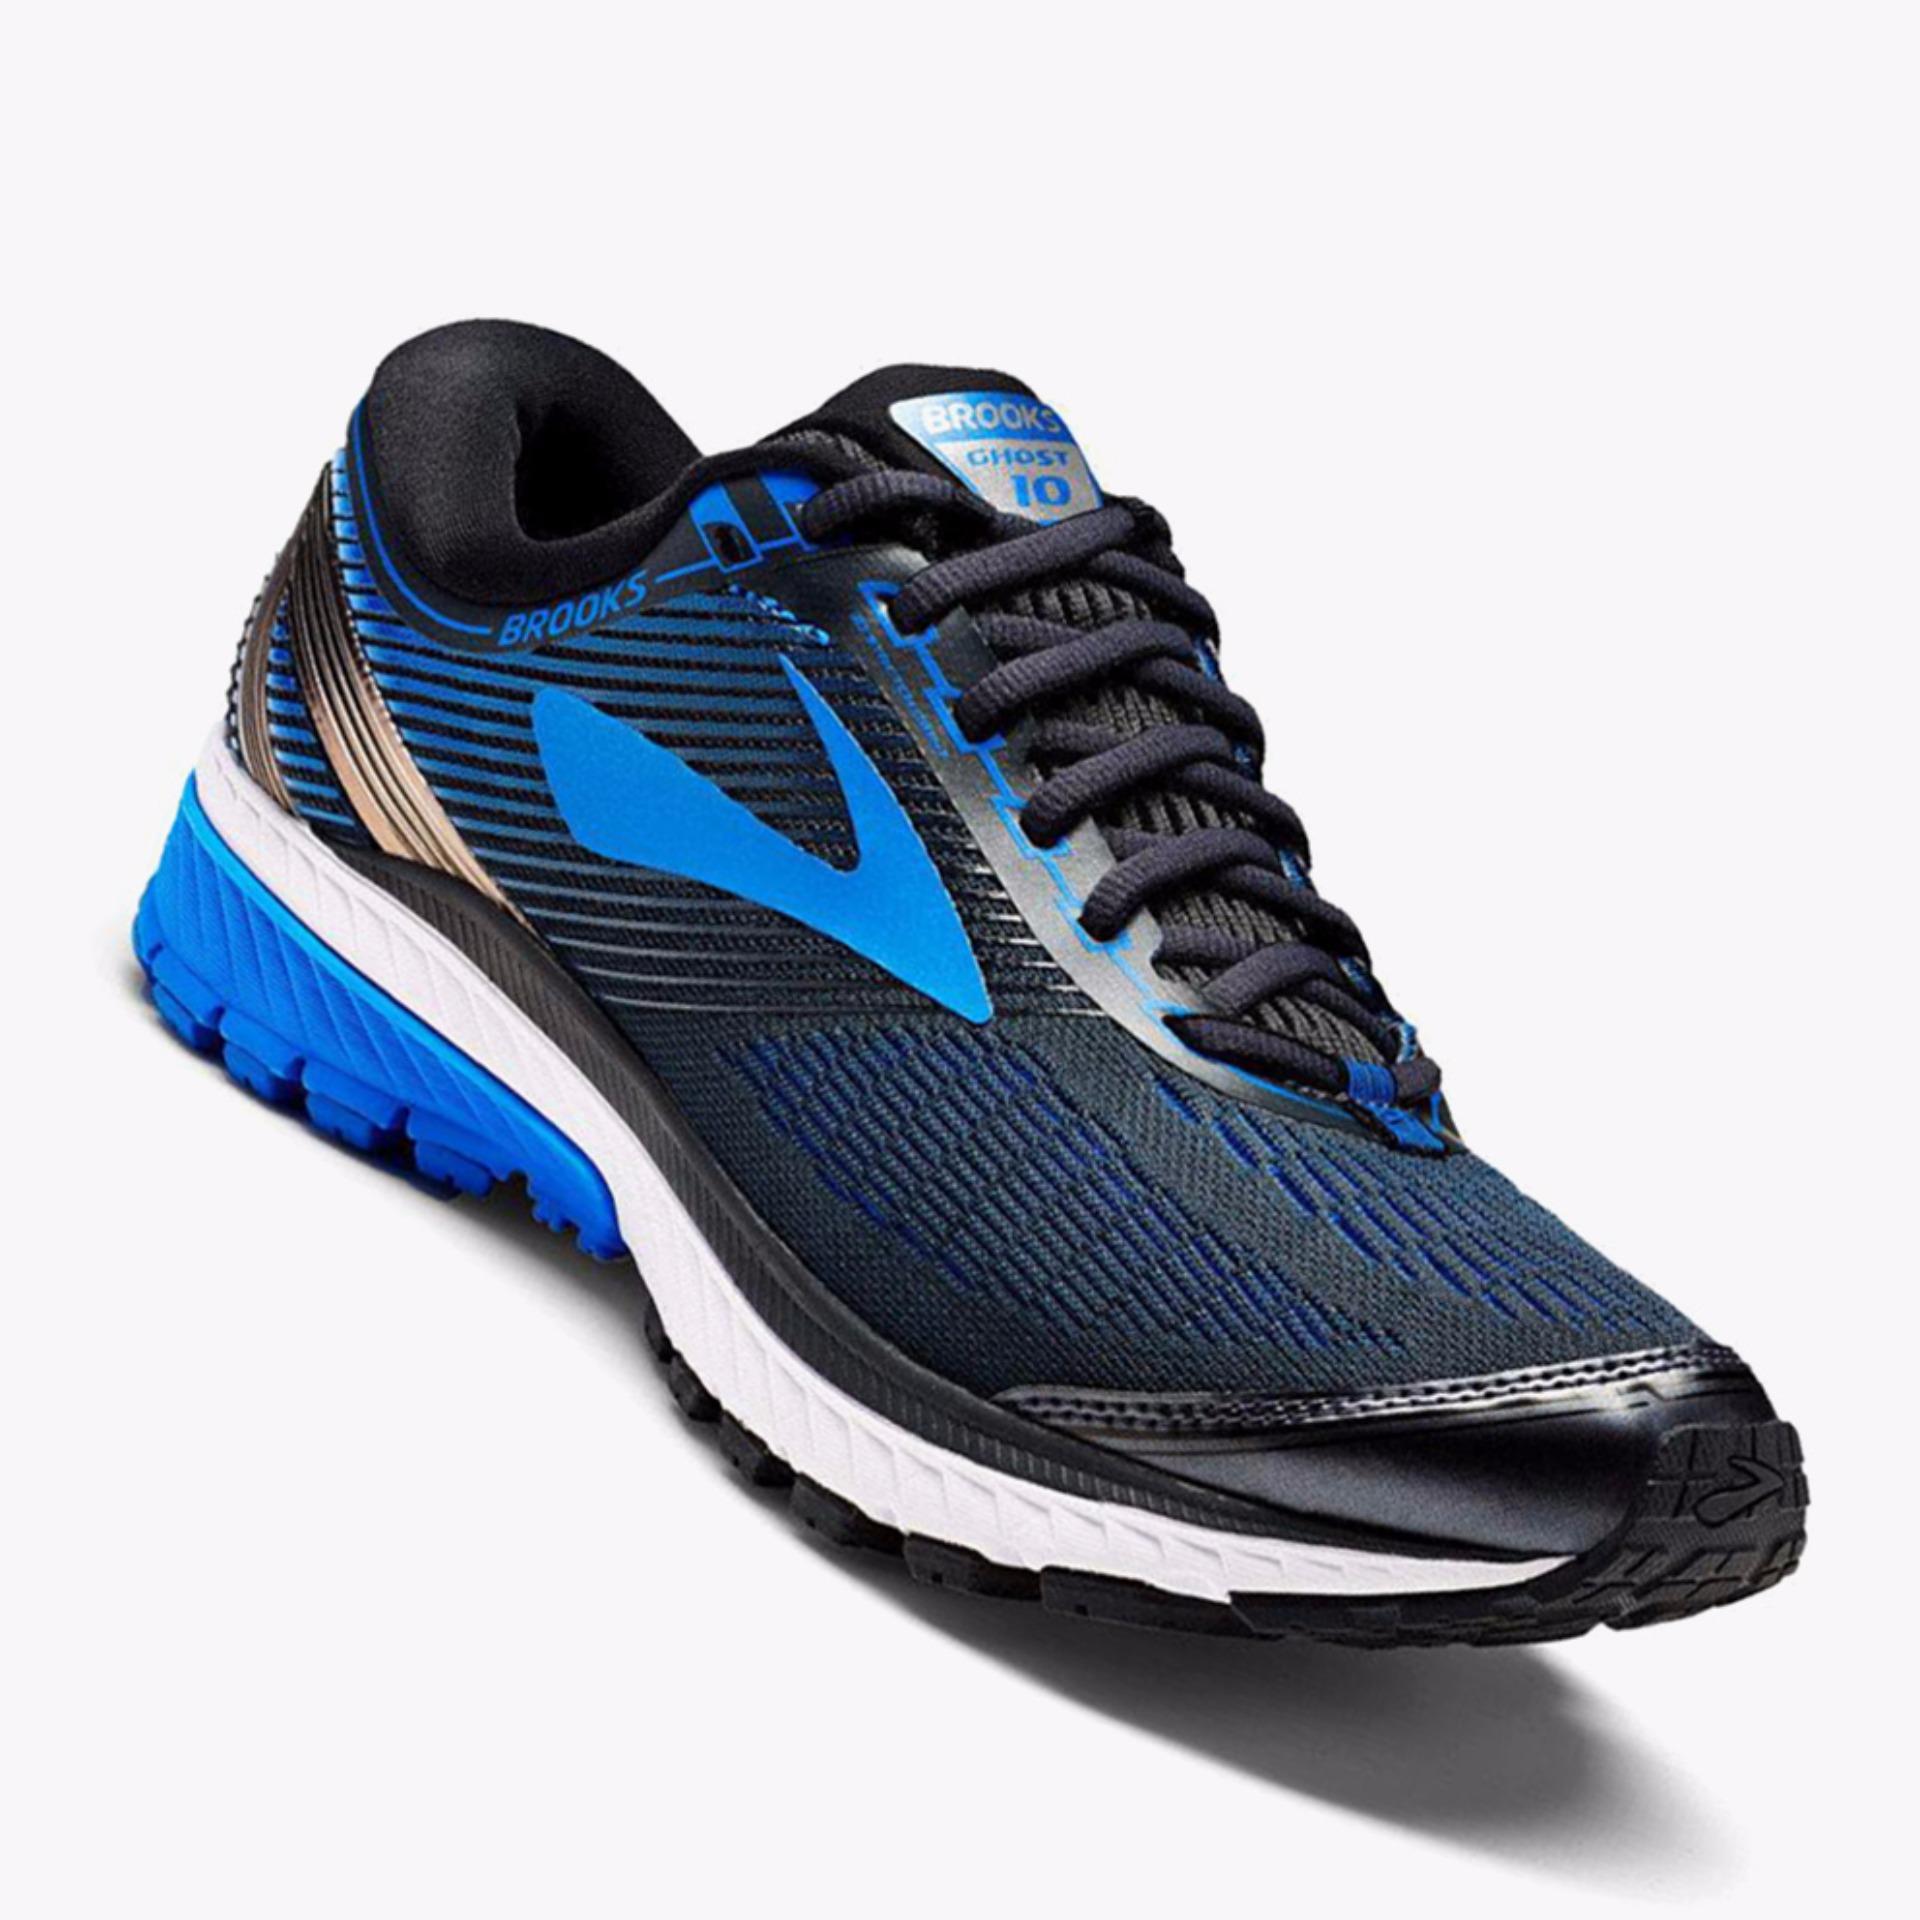 Harga Brooks Ghost 10 Men S Running Shoes Normal D Biru Asli Brooks